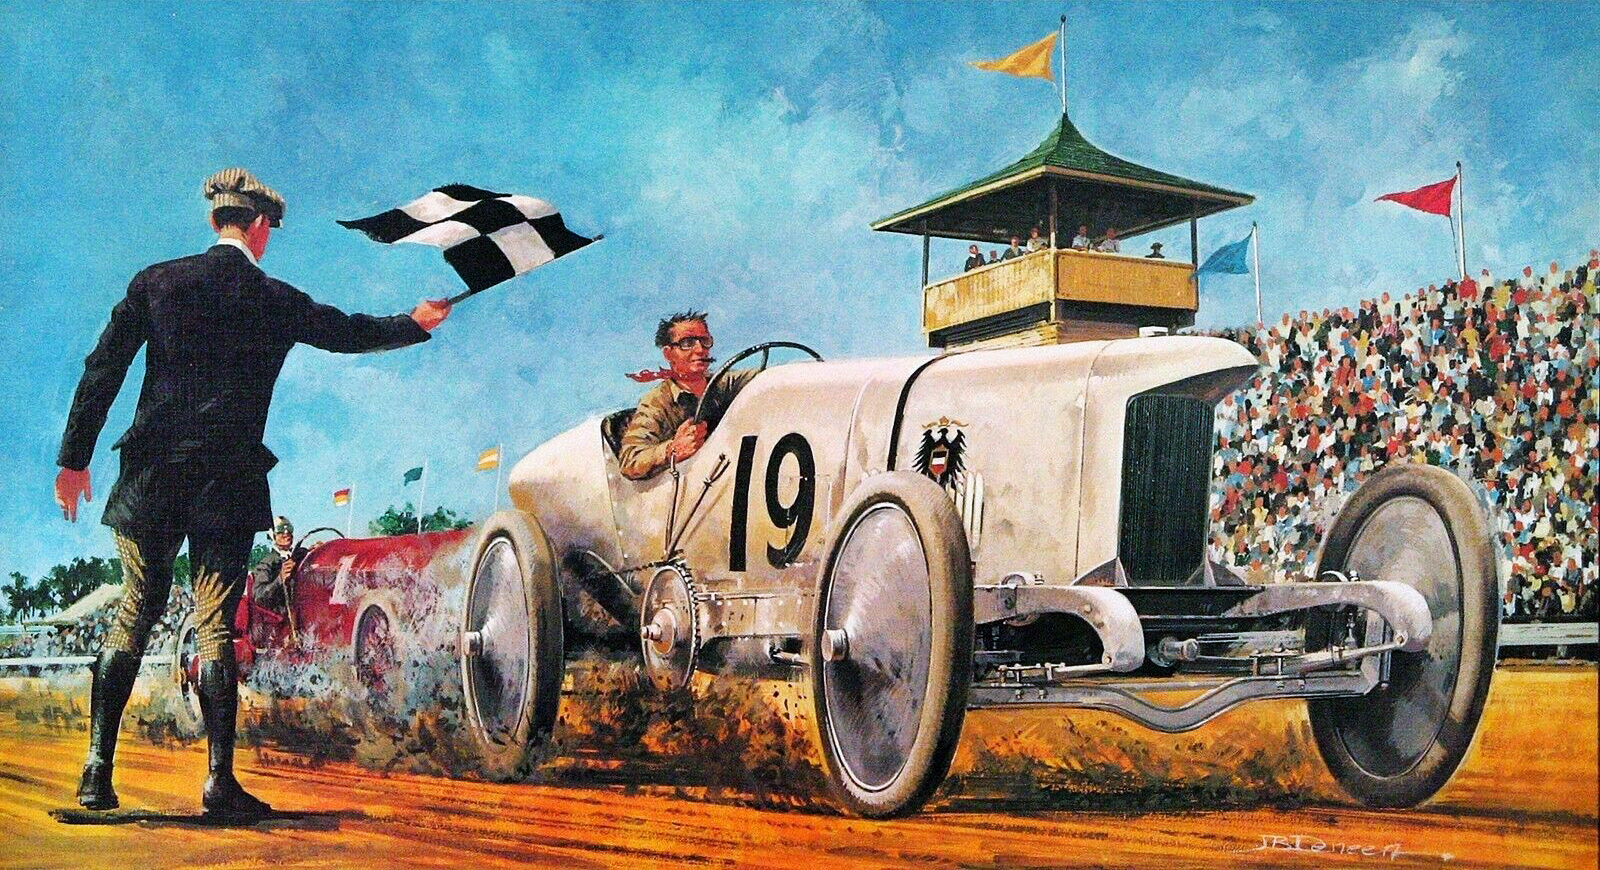 1911. Blitzen-Benz. Illustrated by James B. Deneen